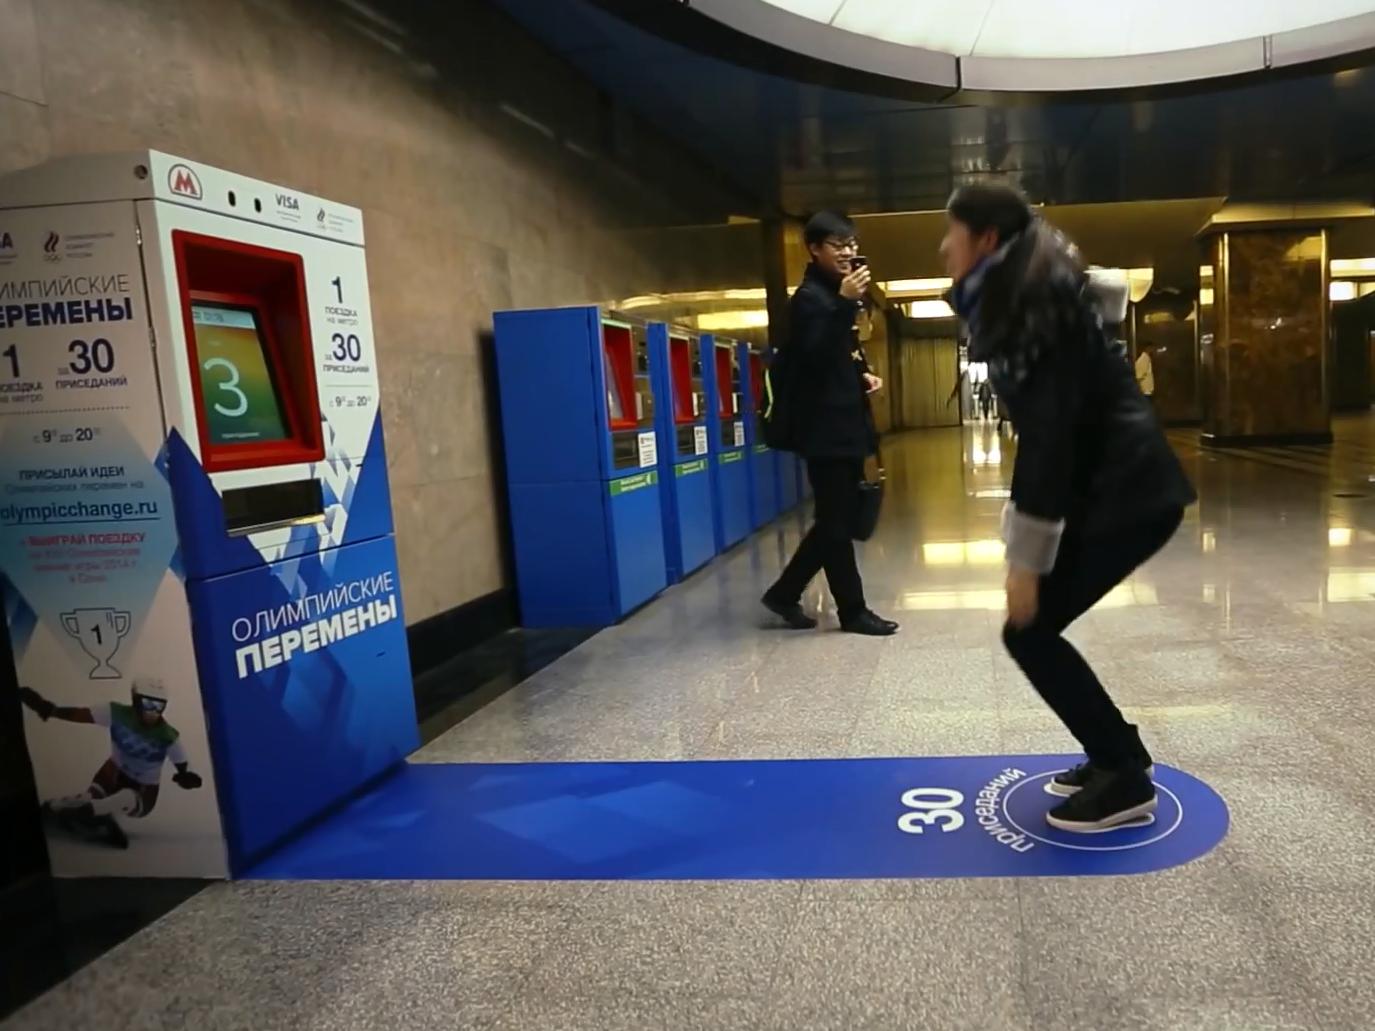 Kniebeugen-Automat Moskau